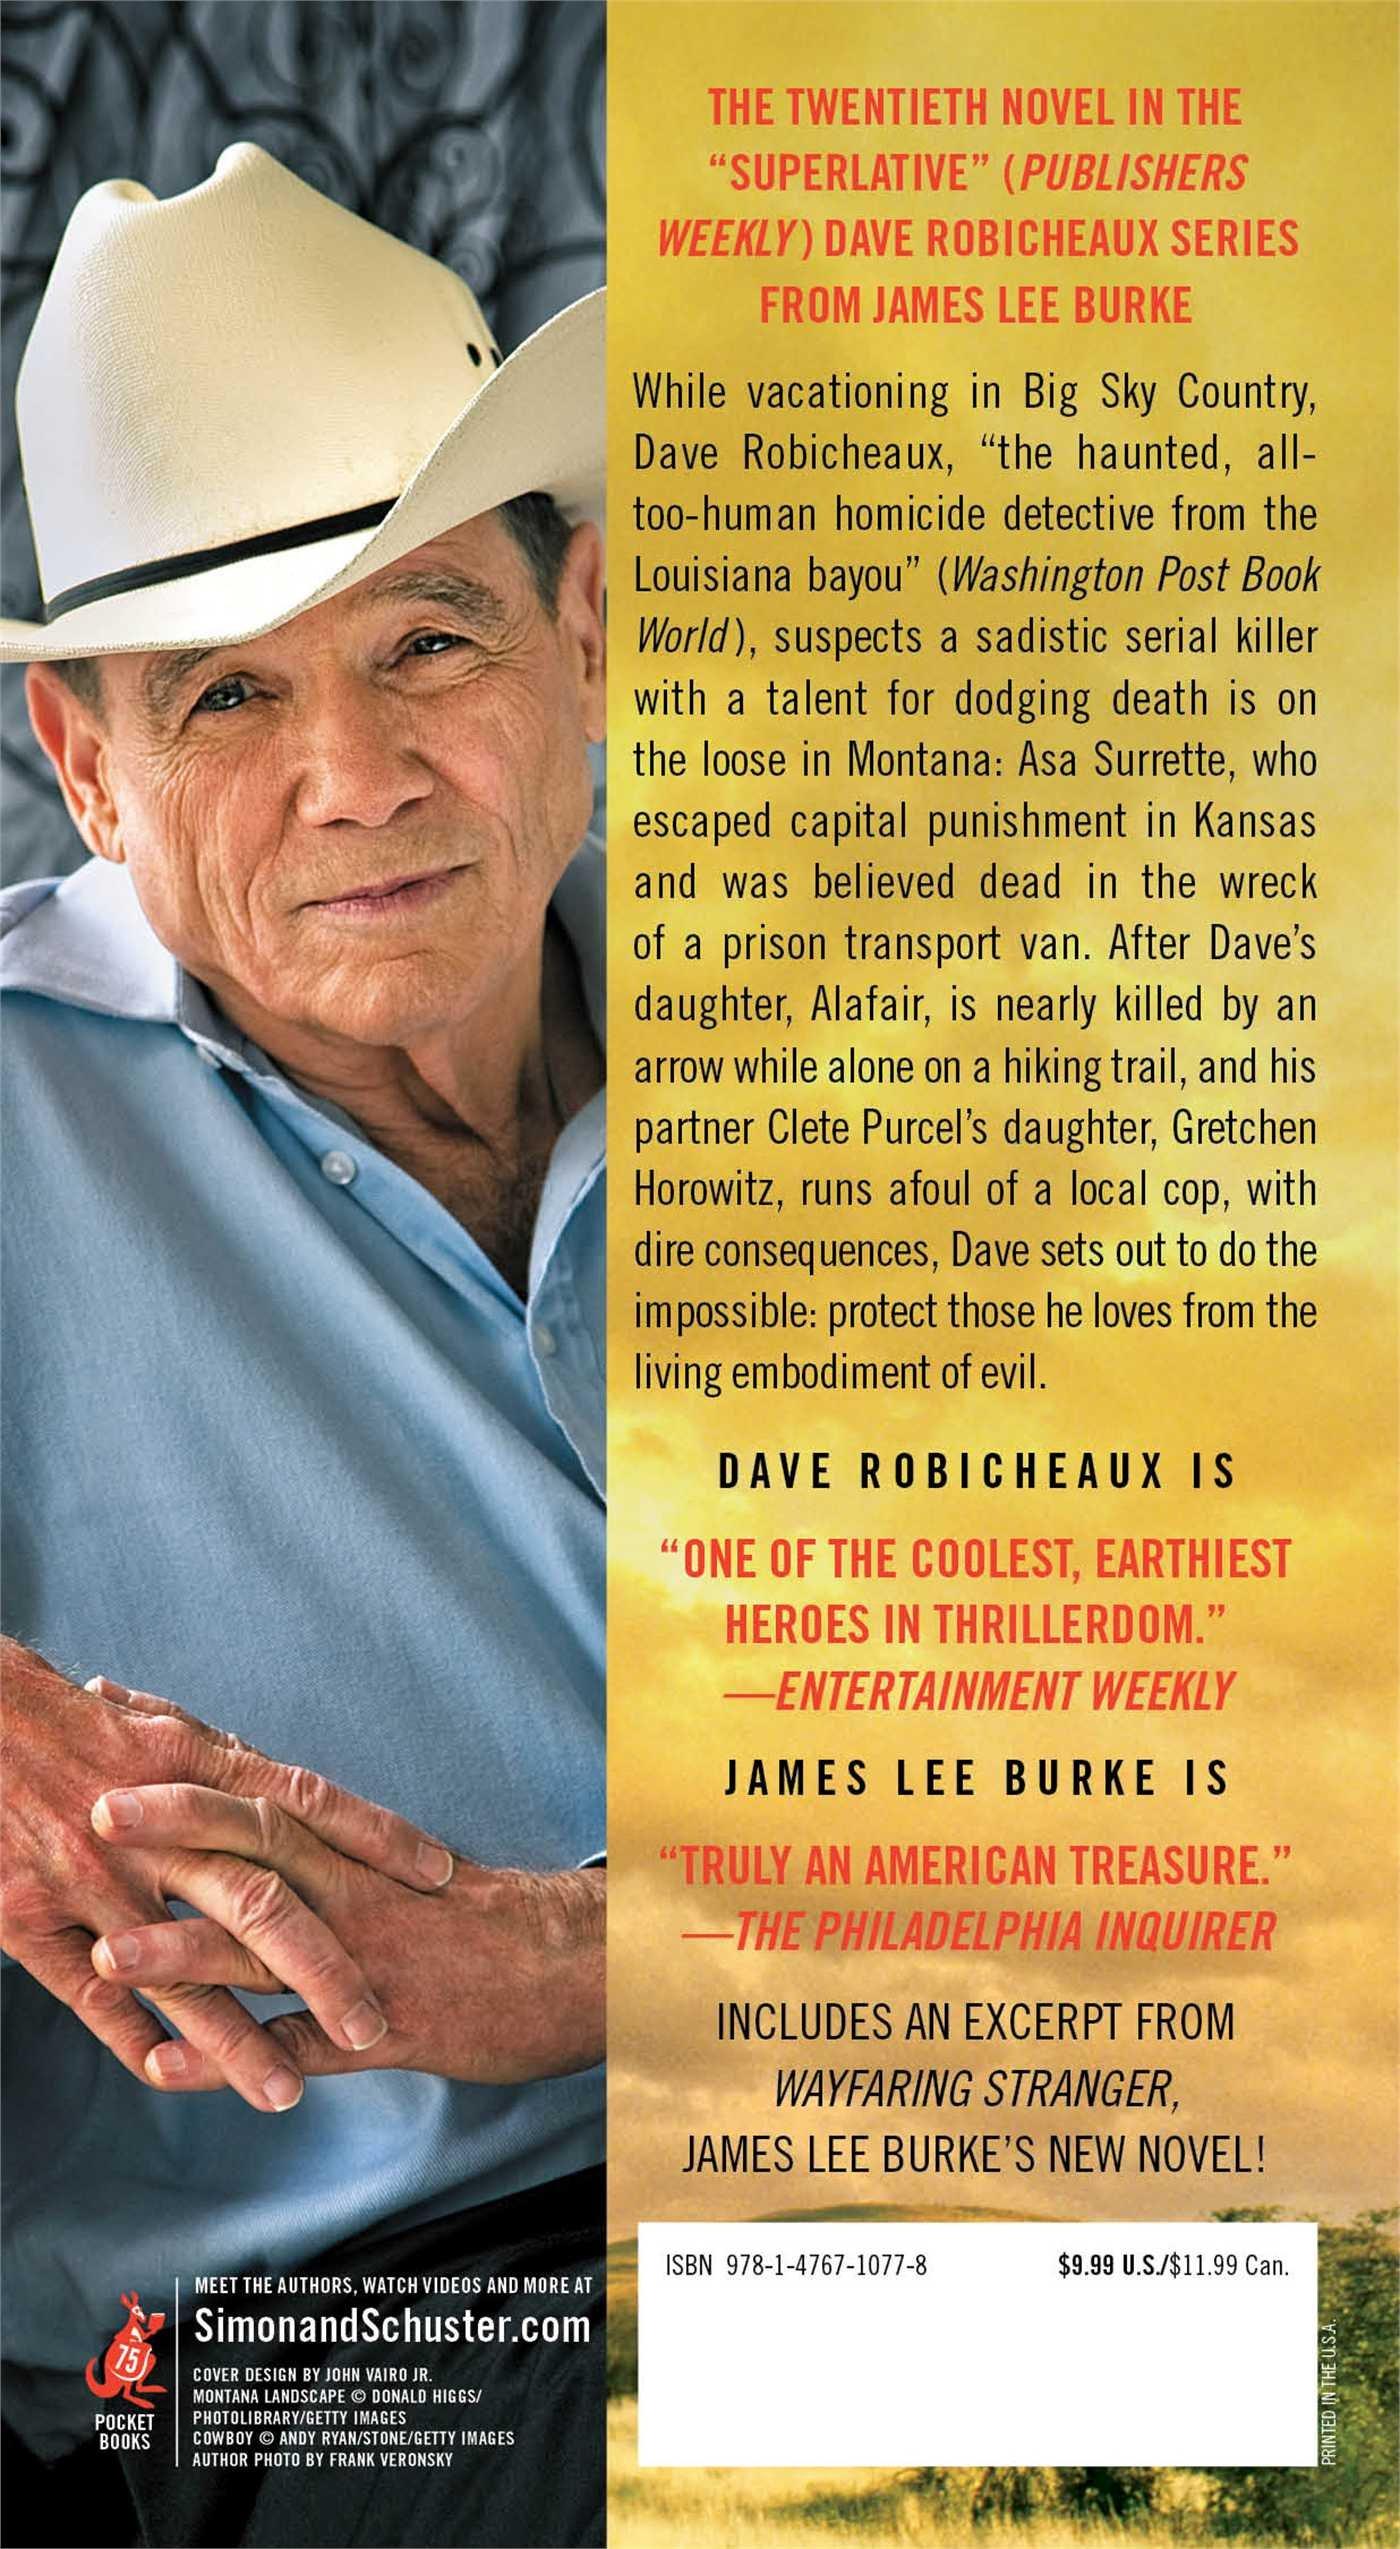 Light Of The World: A Dave Robicheaux Novel: James Lee Burke:  9781476710778: Amazon: Books